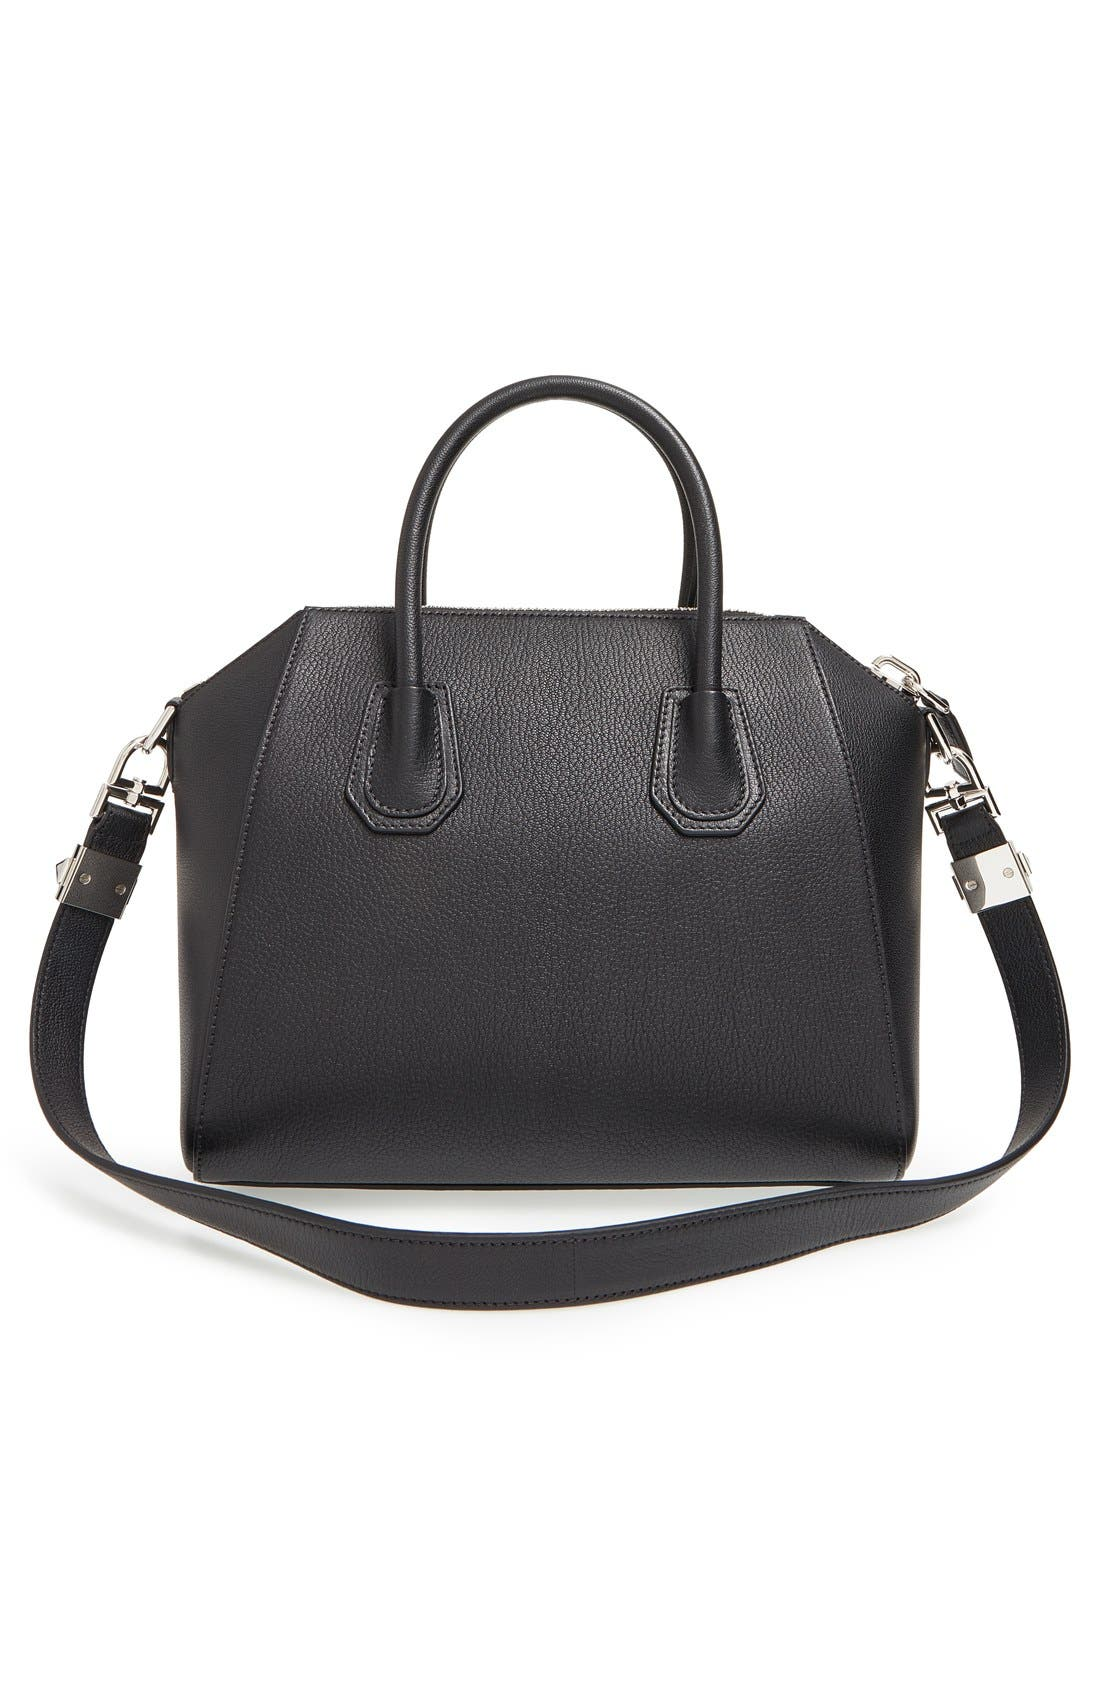 Alternate Image 3  - Givenchy 'Small Antigona' Sugar Leather Satchel